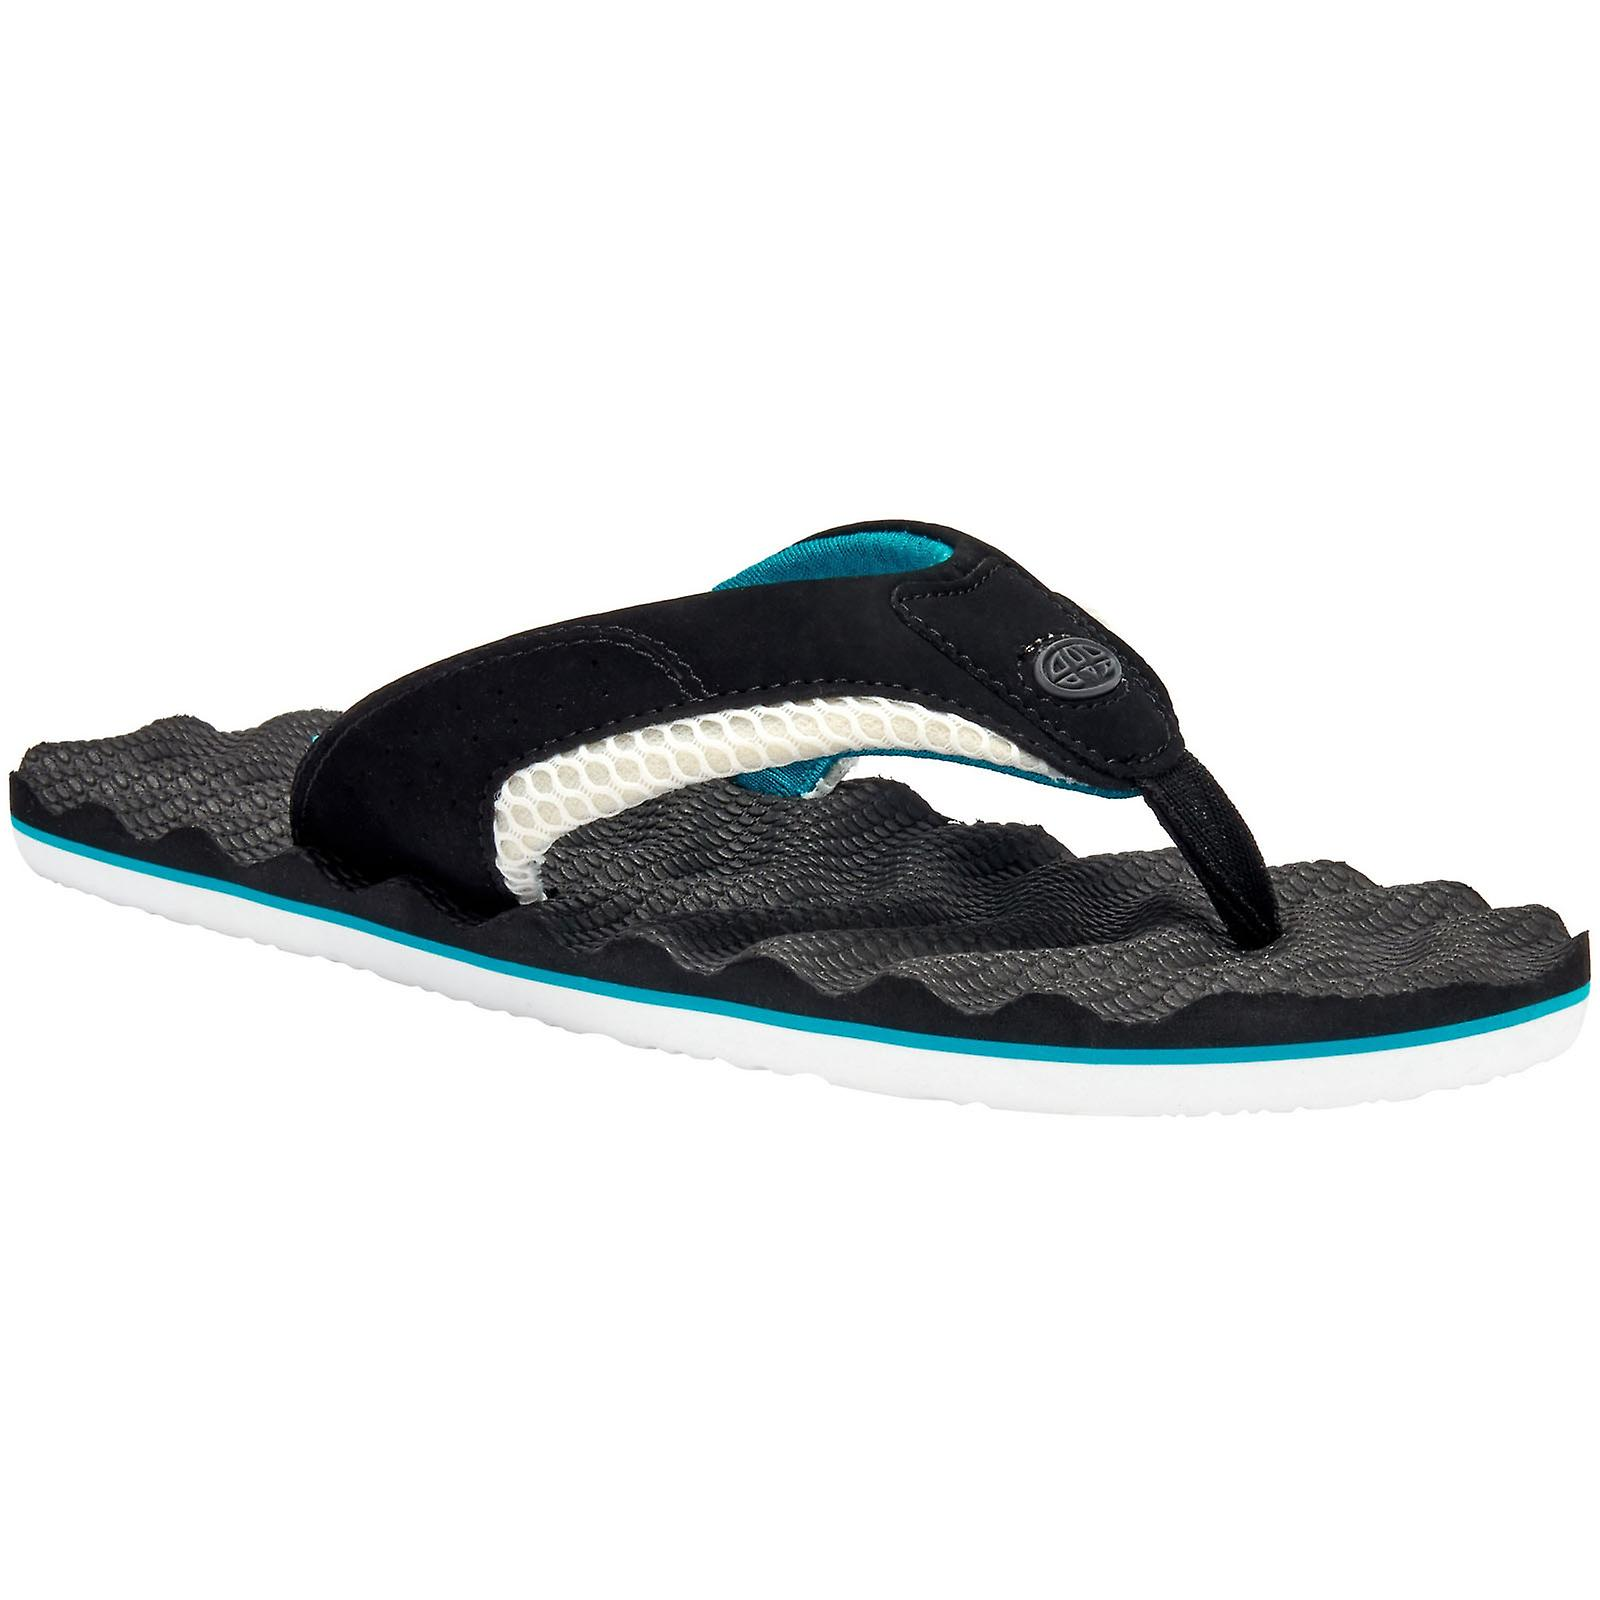 Animal Jekyl Ripple Mens Beach Holiday Slip On Sandals Flip Flops